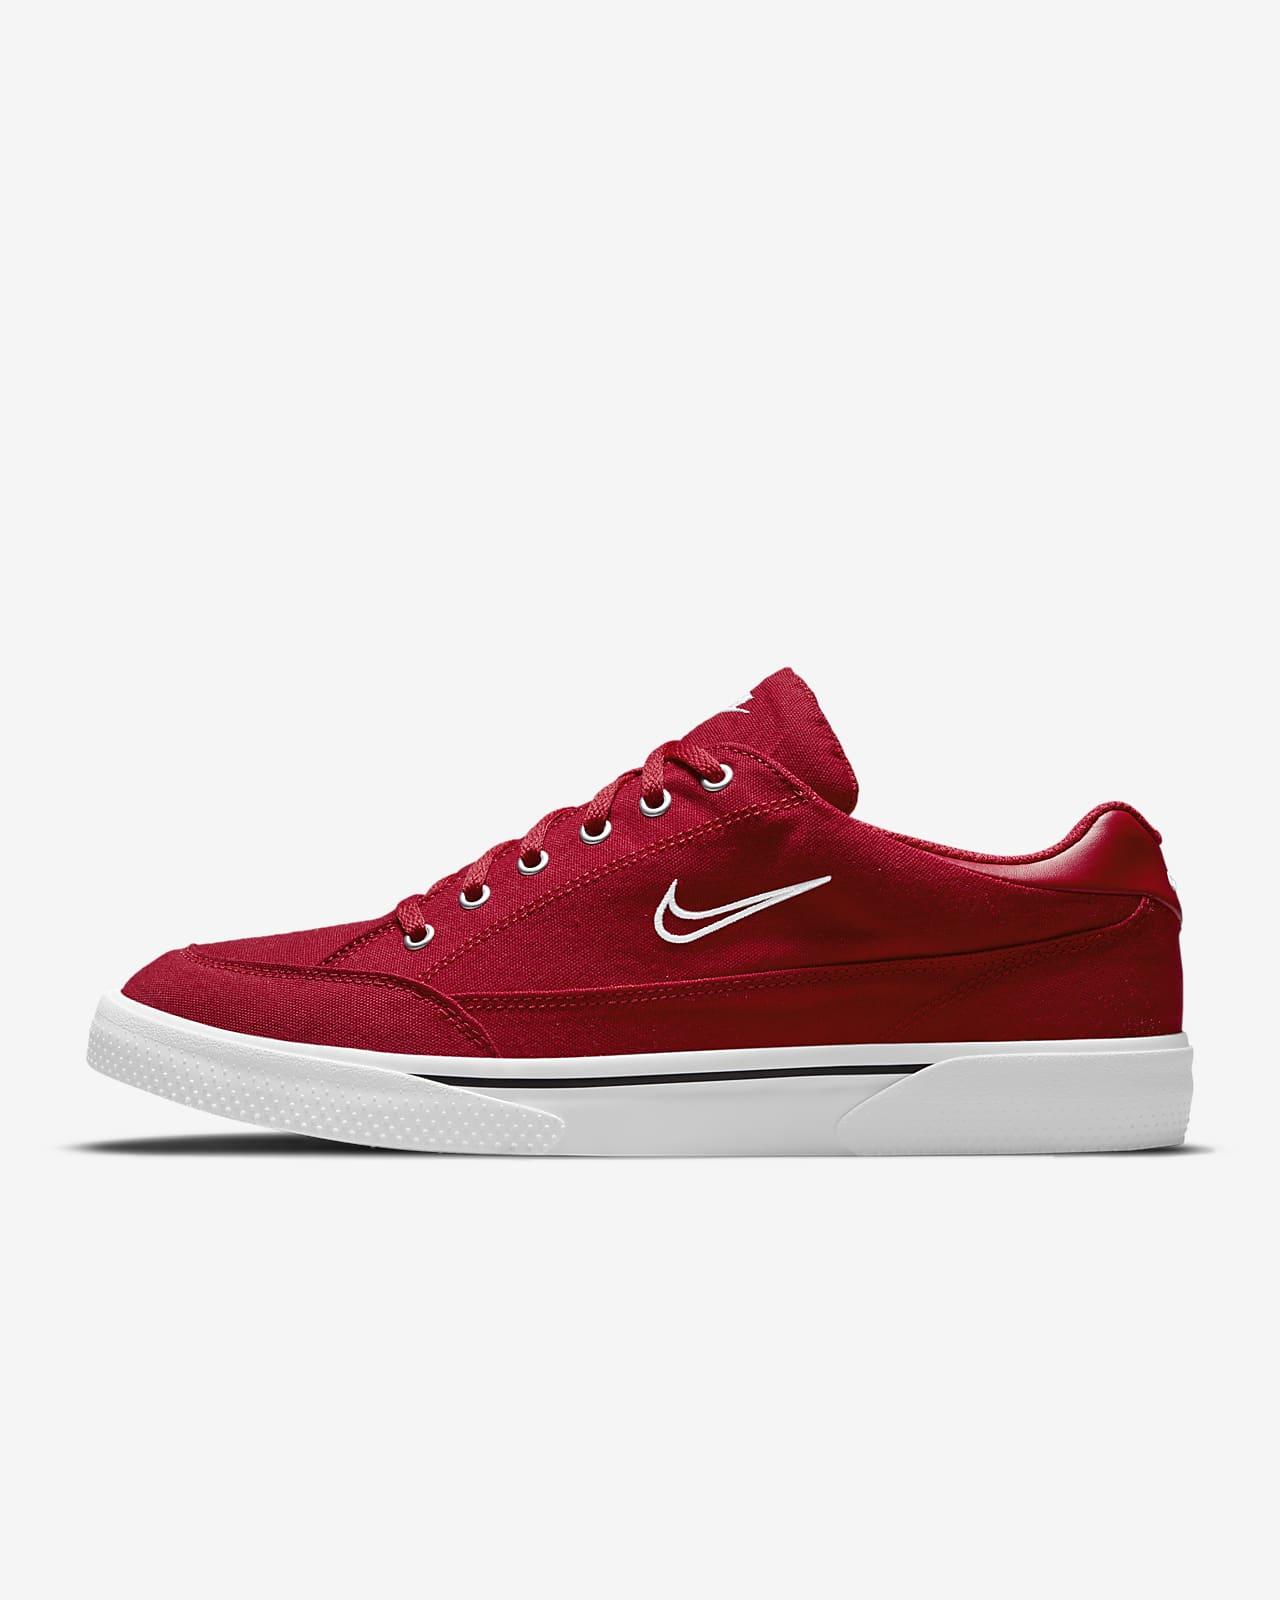 Nike Retro GTS Men's Shoe